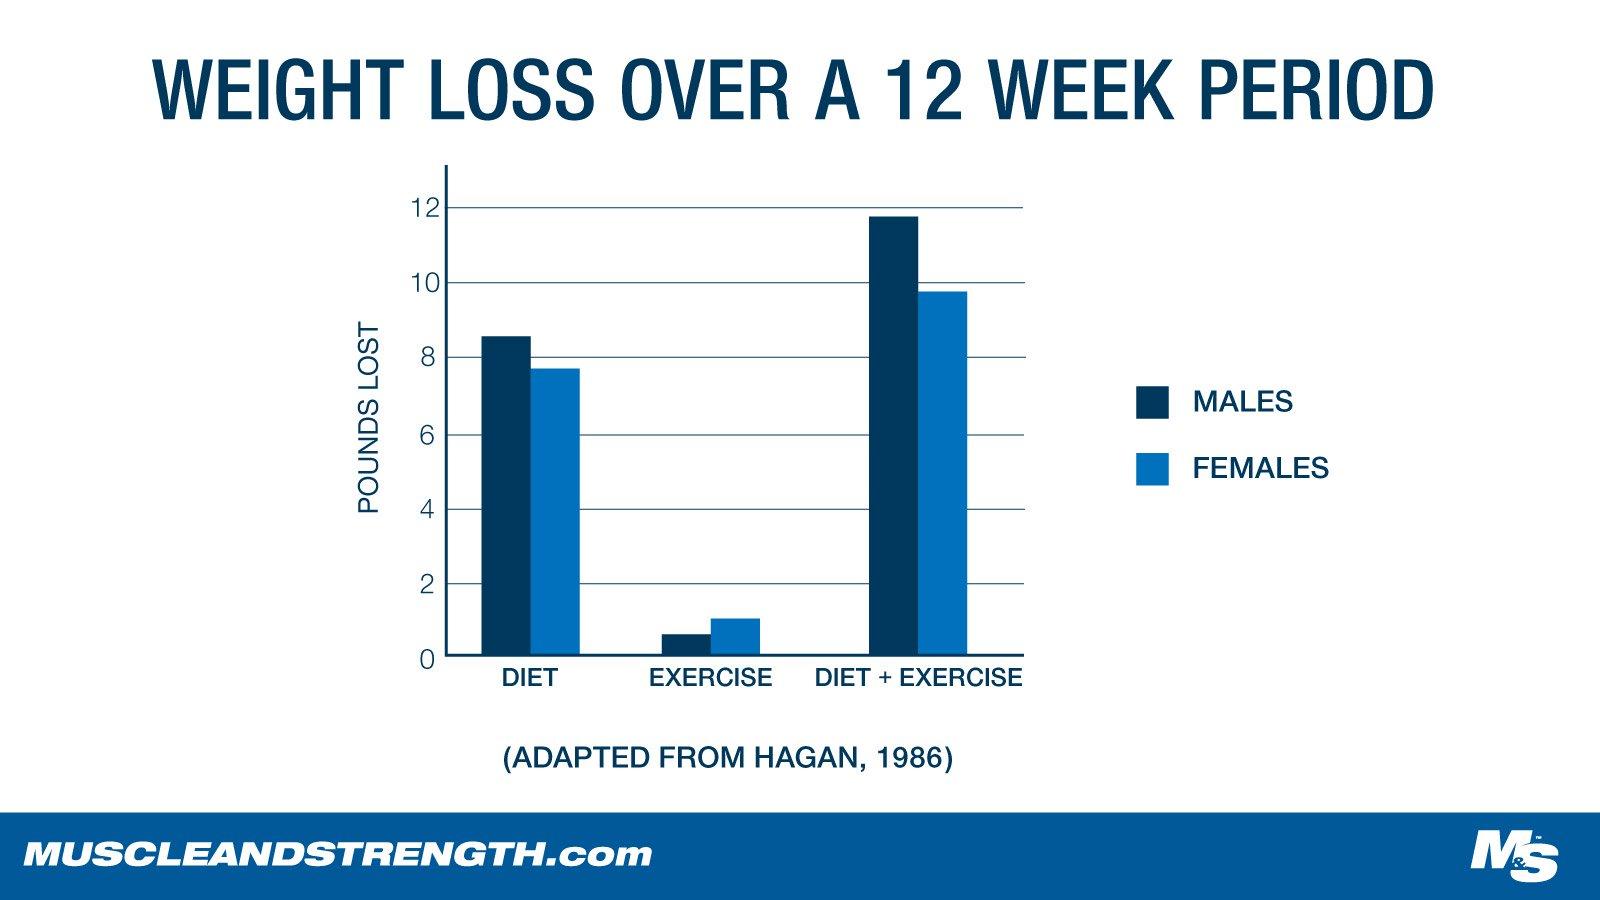 12 Week Weight Loss Study